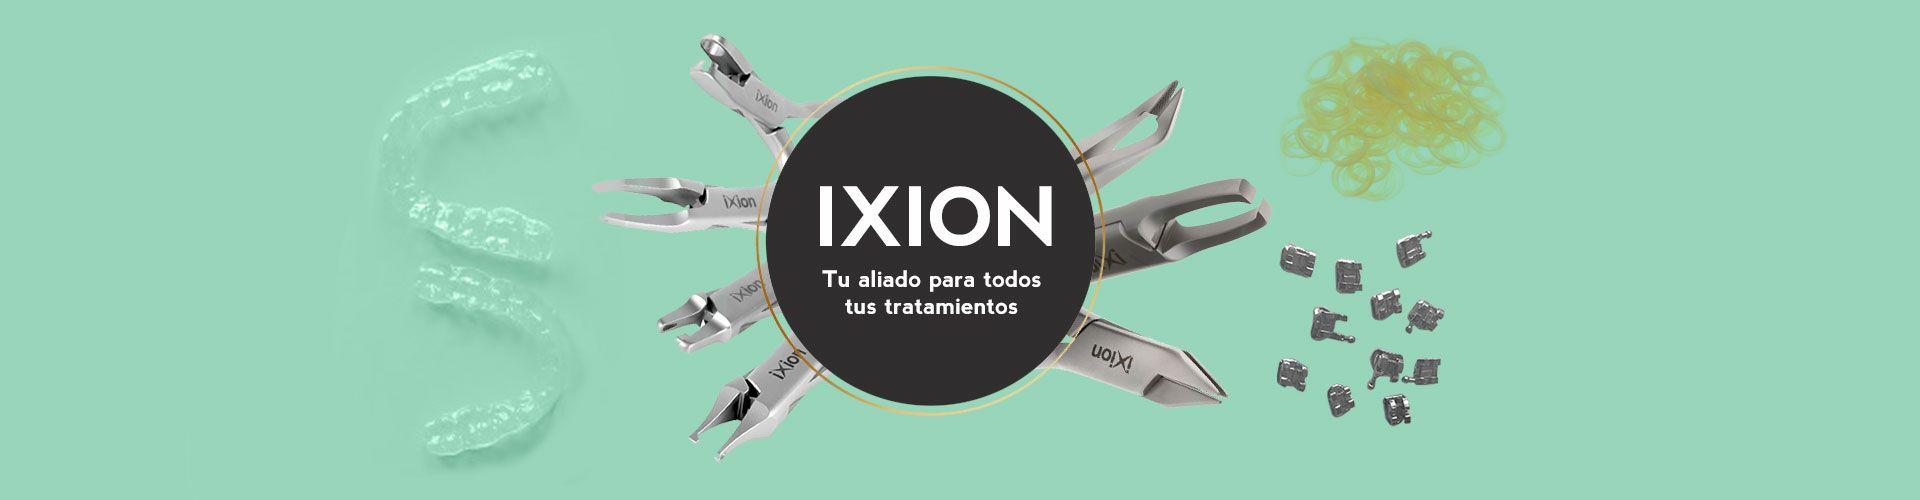 Ixion Alicates